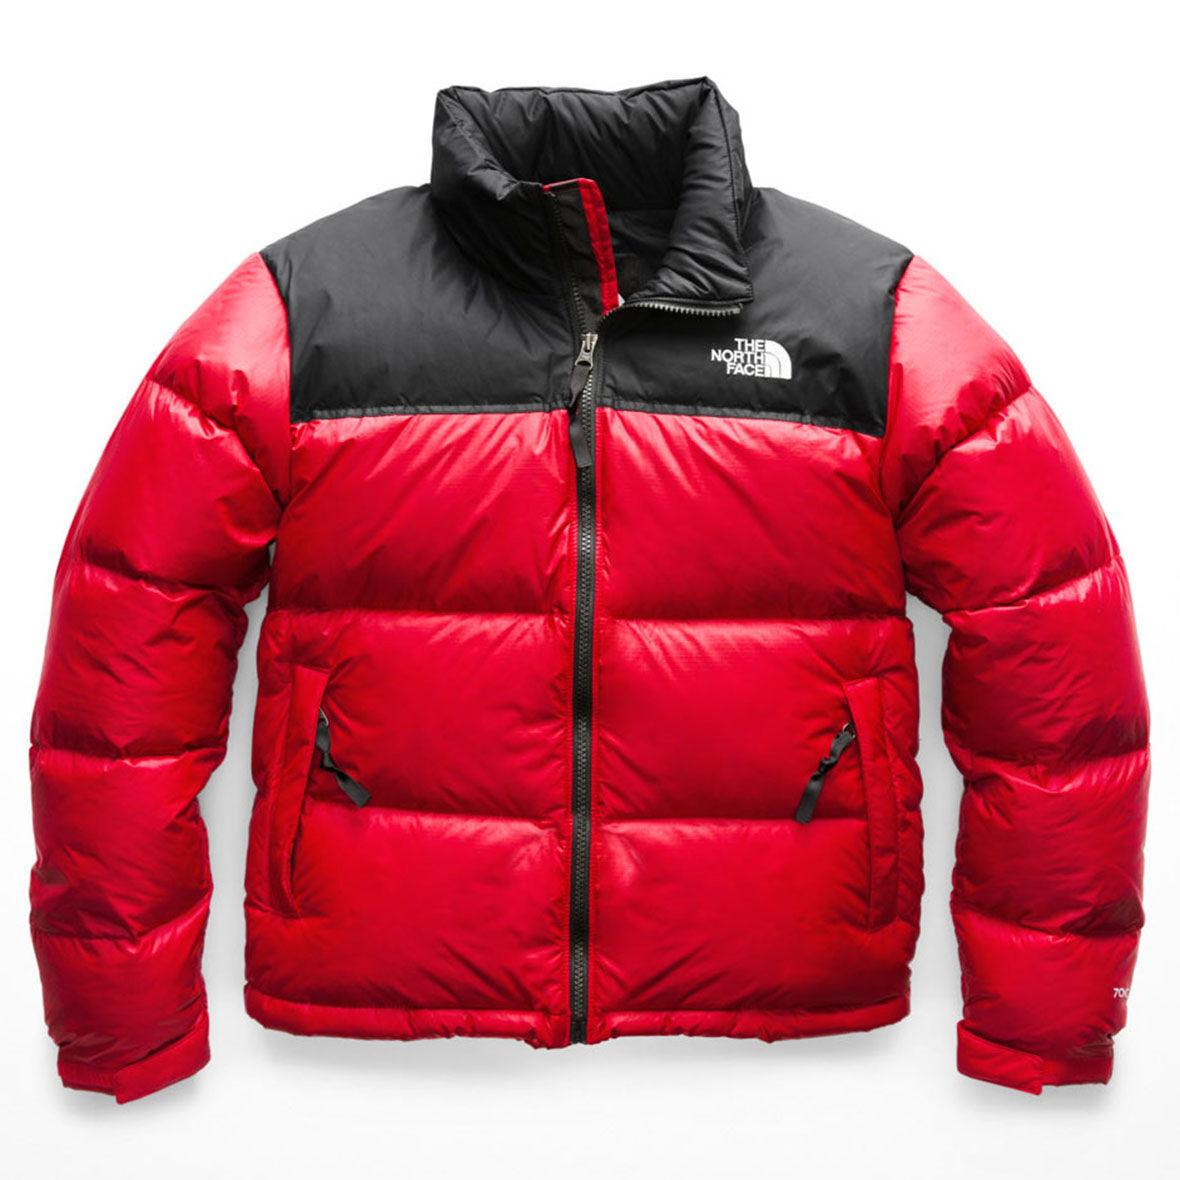 44dc786b9 ... fill goose down da915 aa8bc; order womens 1996 retro novelty nuptse jacket  womens 1996 retro novelty nuptse jacket. the north